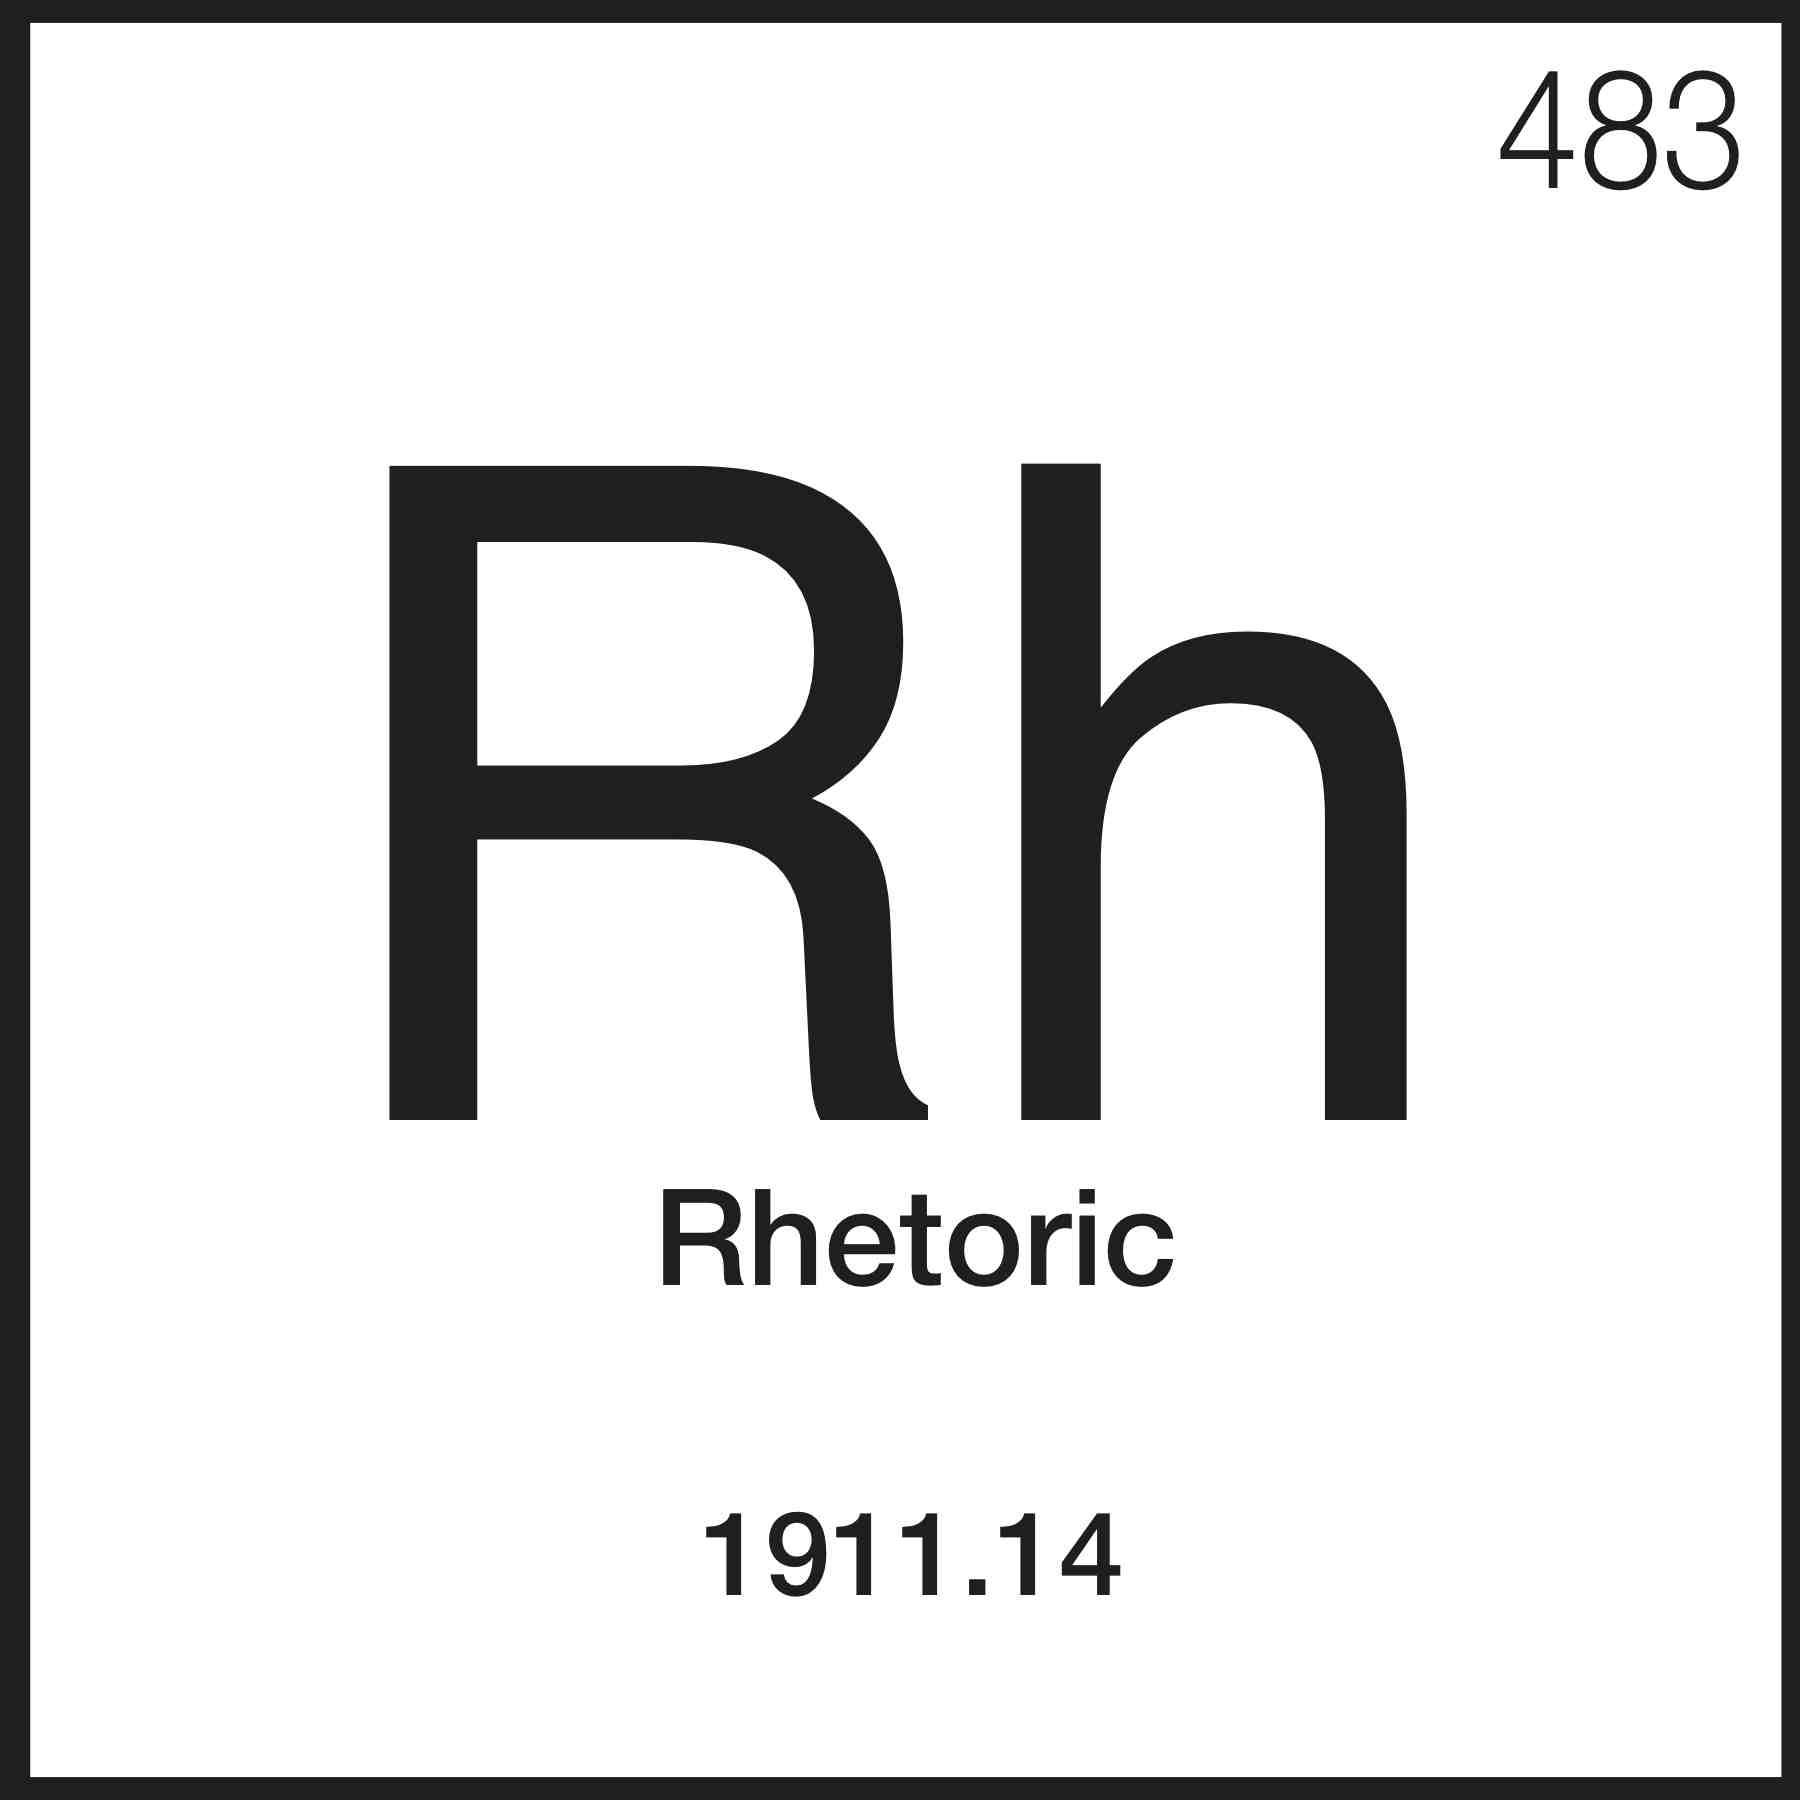 element rh small